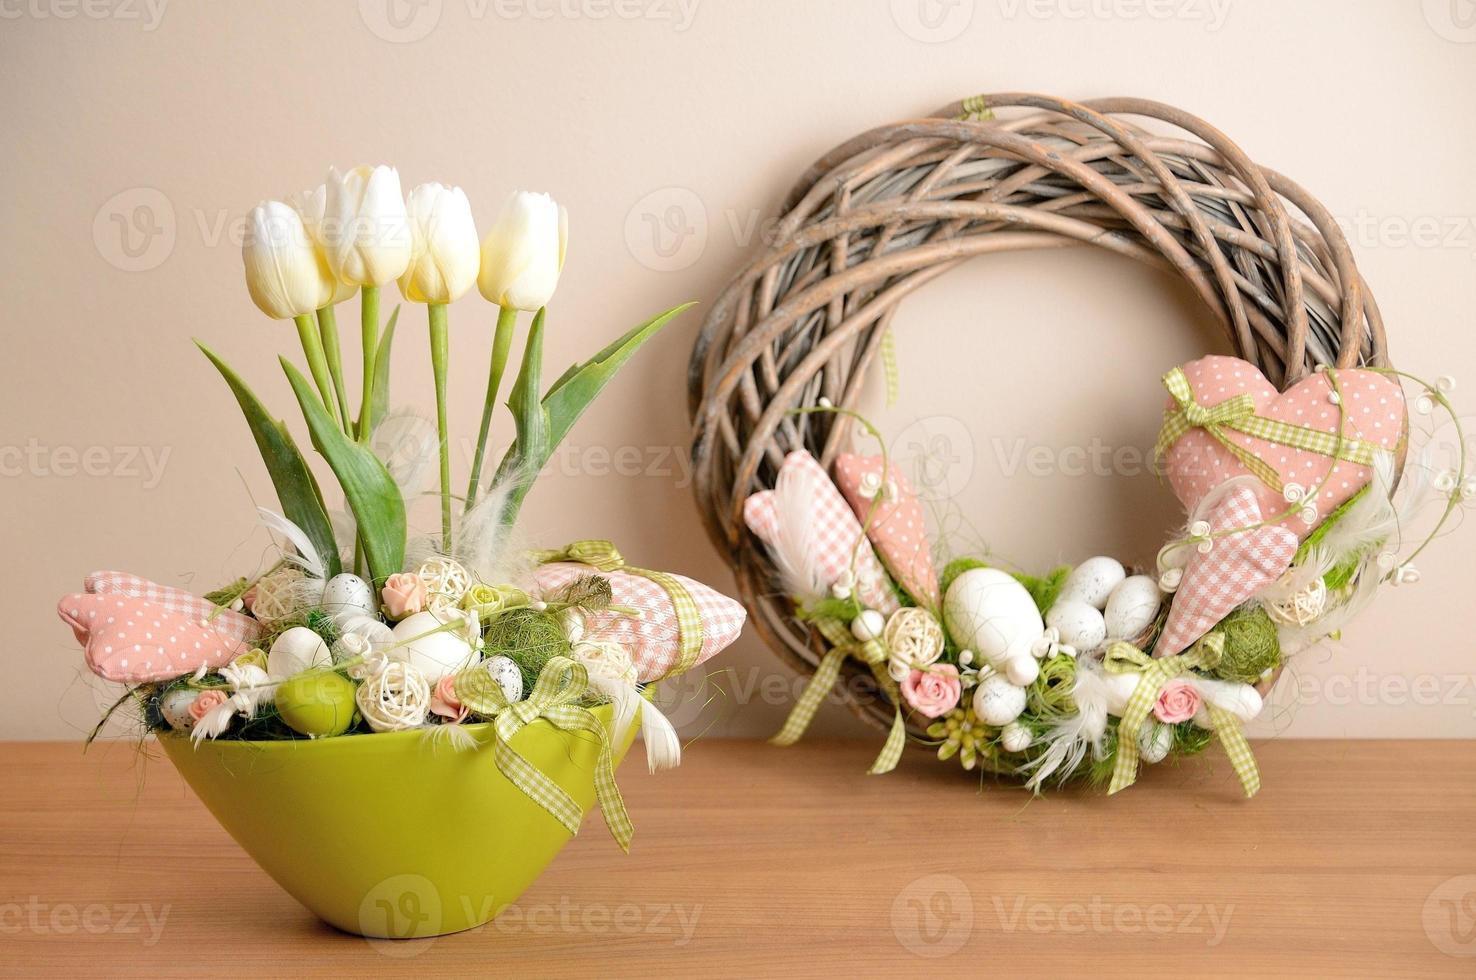 decoração primavera foto